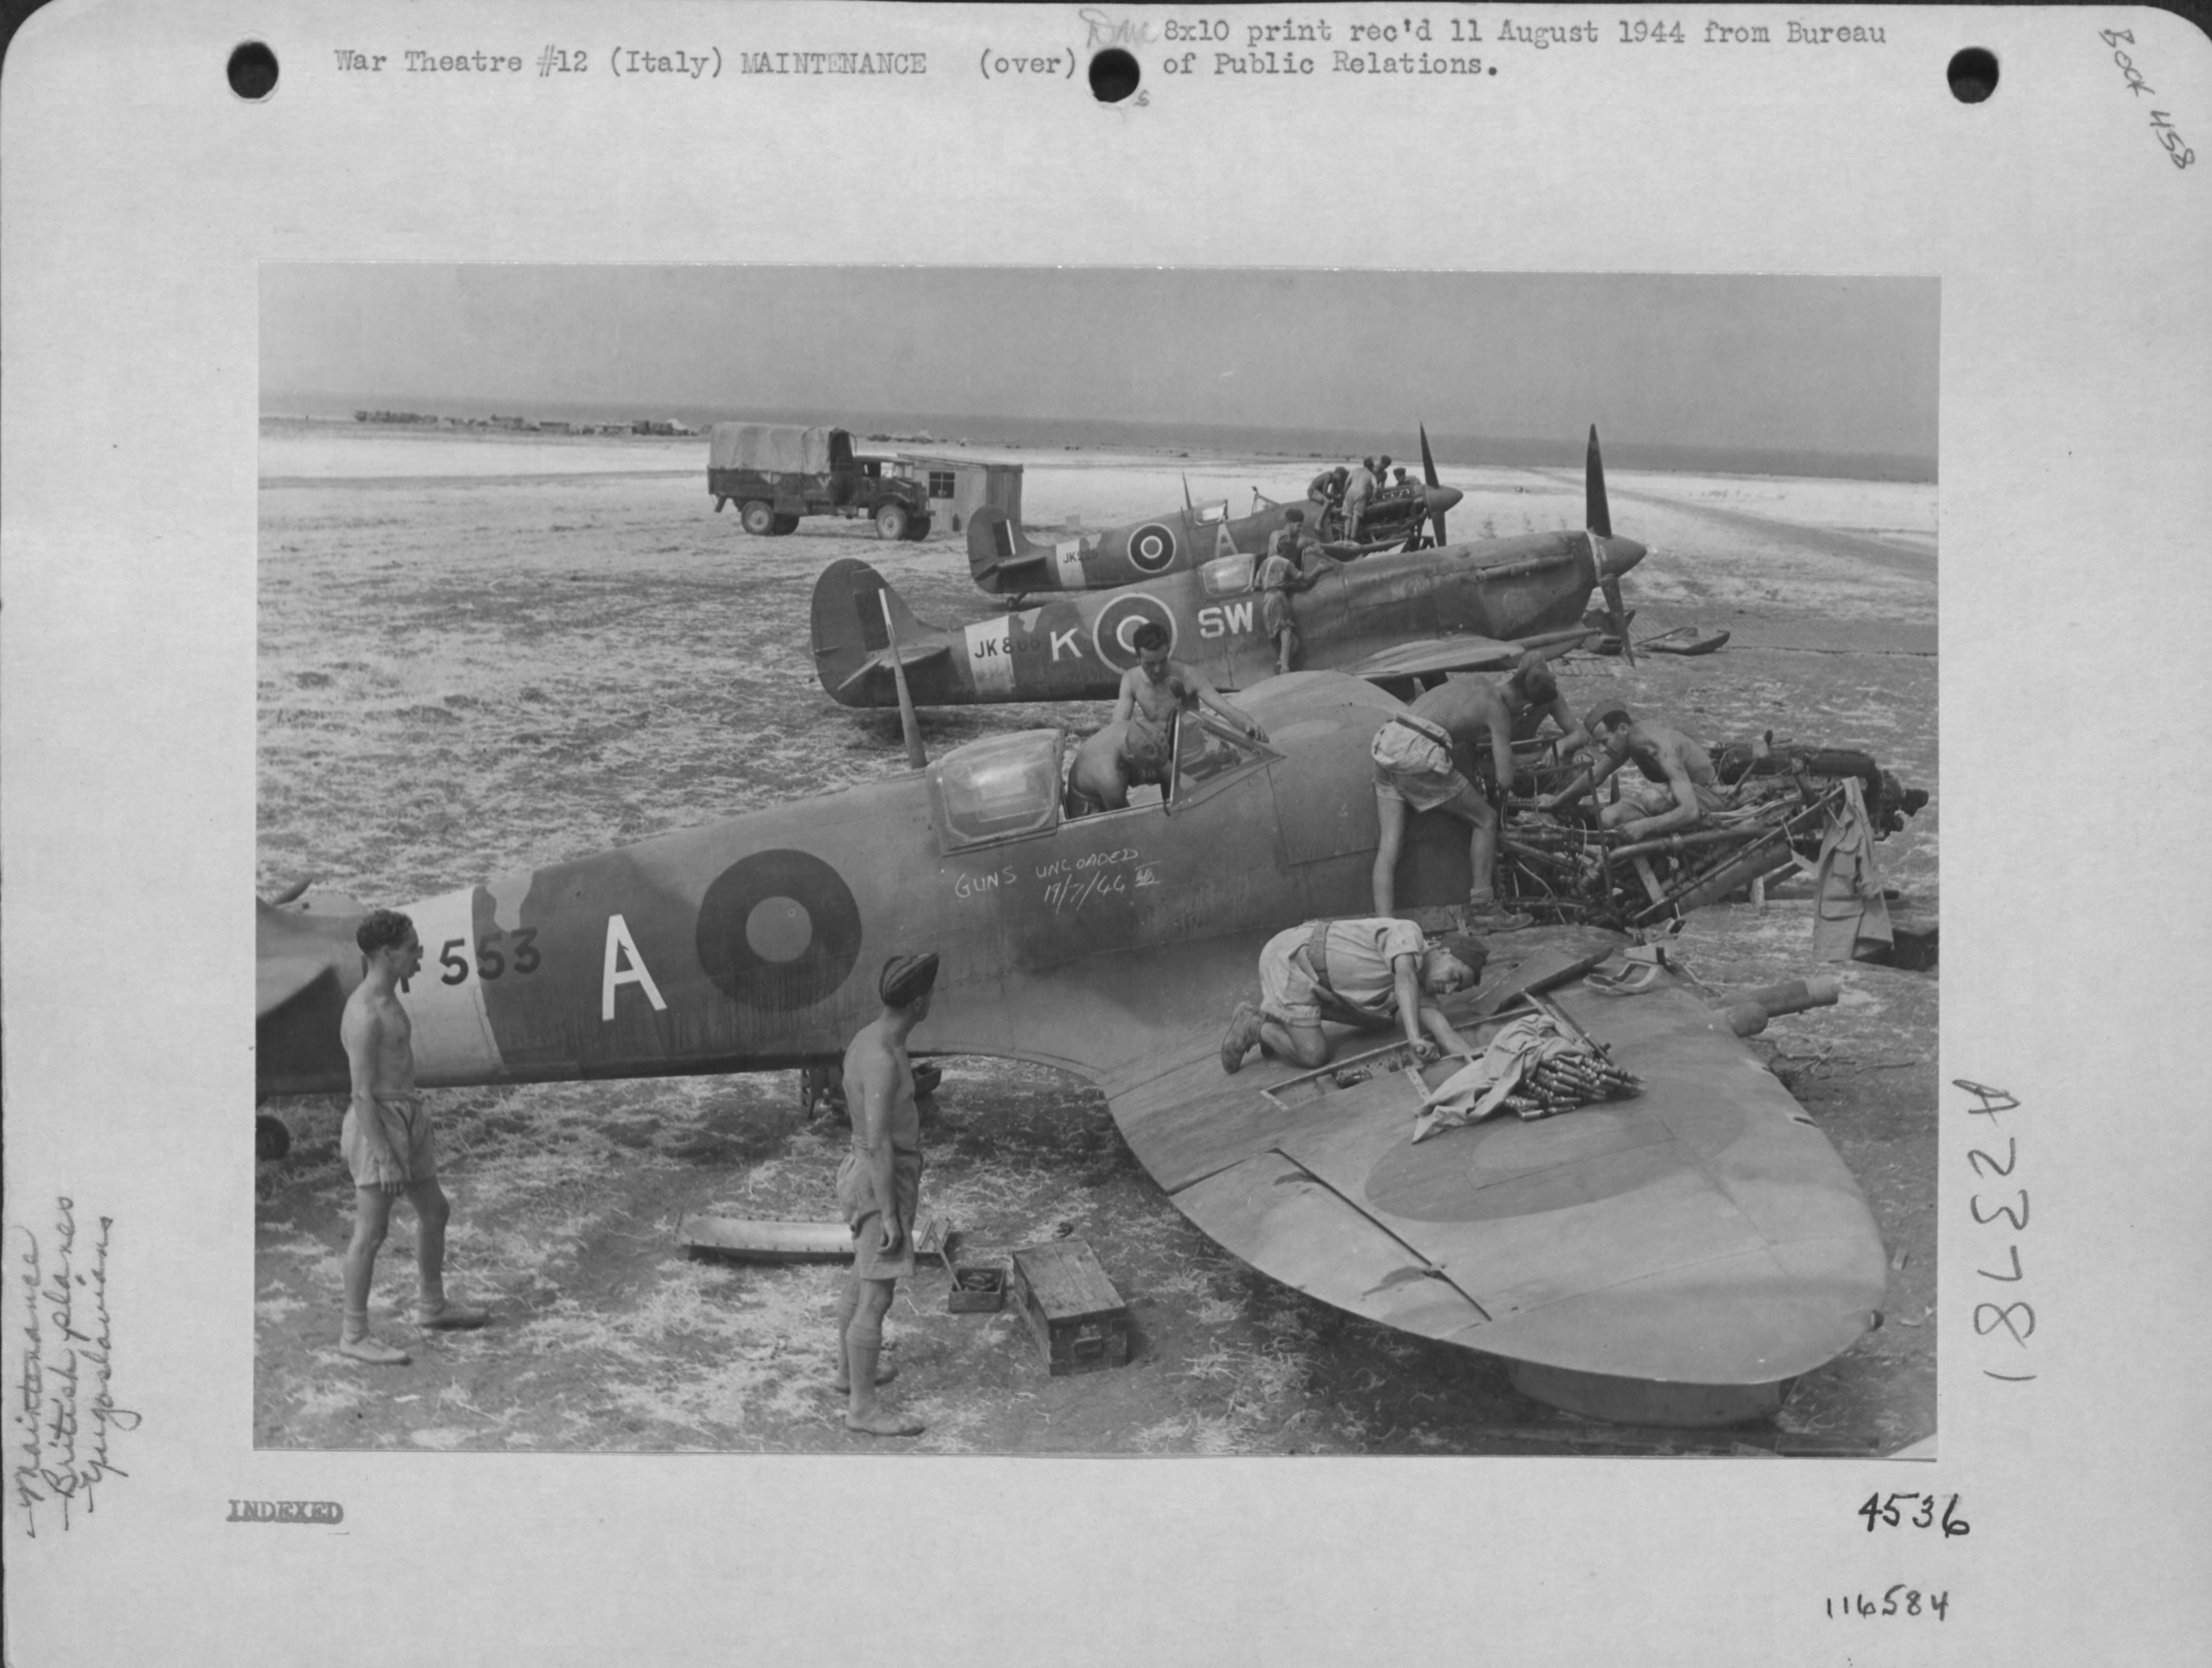 Spitfire MkVcTrop RAF 253Sqn SWK undergoing repairs JK868 Italy July 19 1944 01